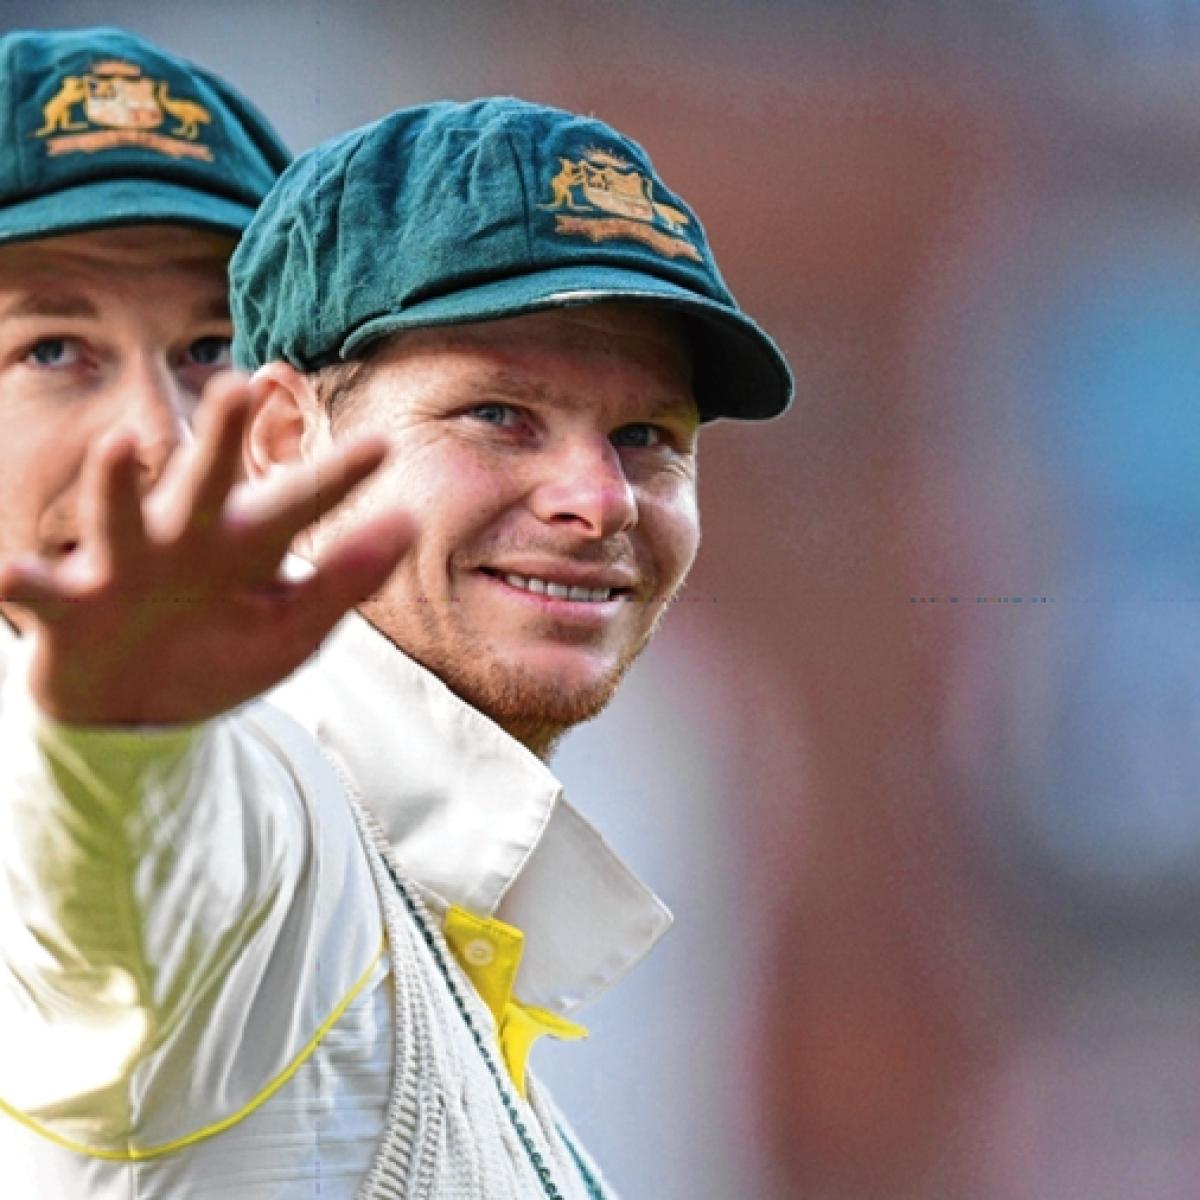 Aussie pride restored in Ashes triumph